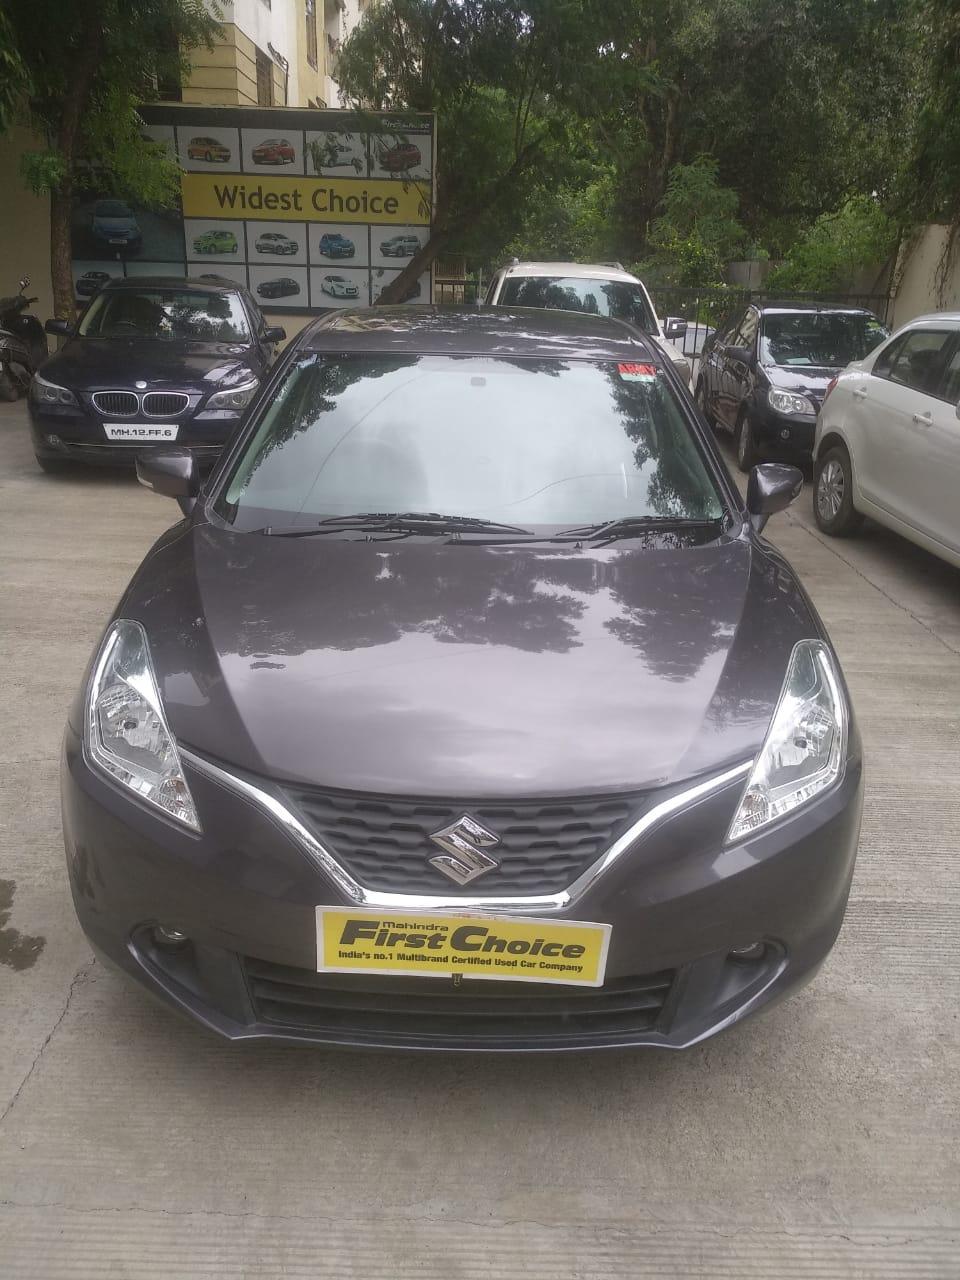 Used Maruti Suzuki in Pune - Mahindra First Choice